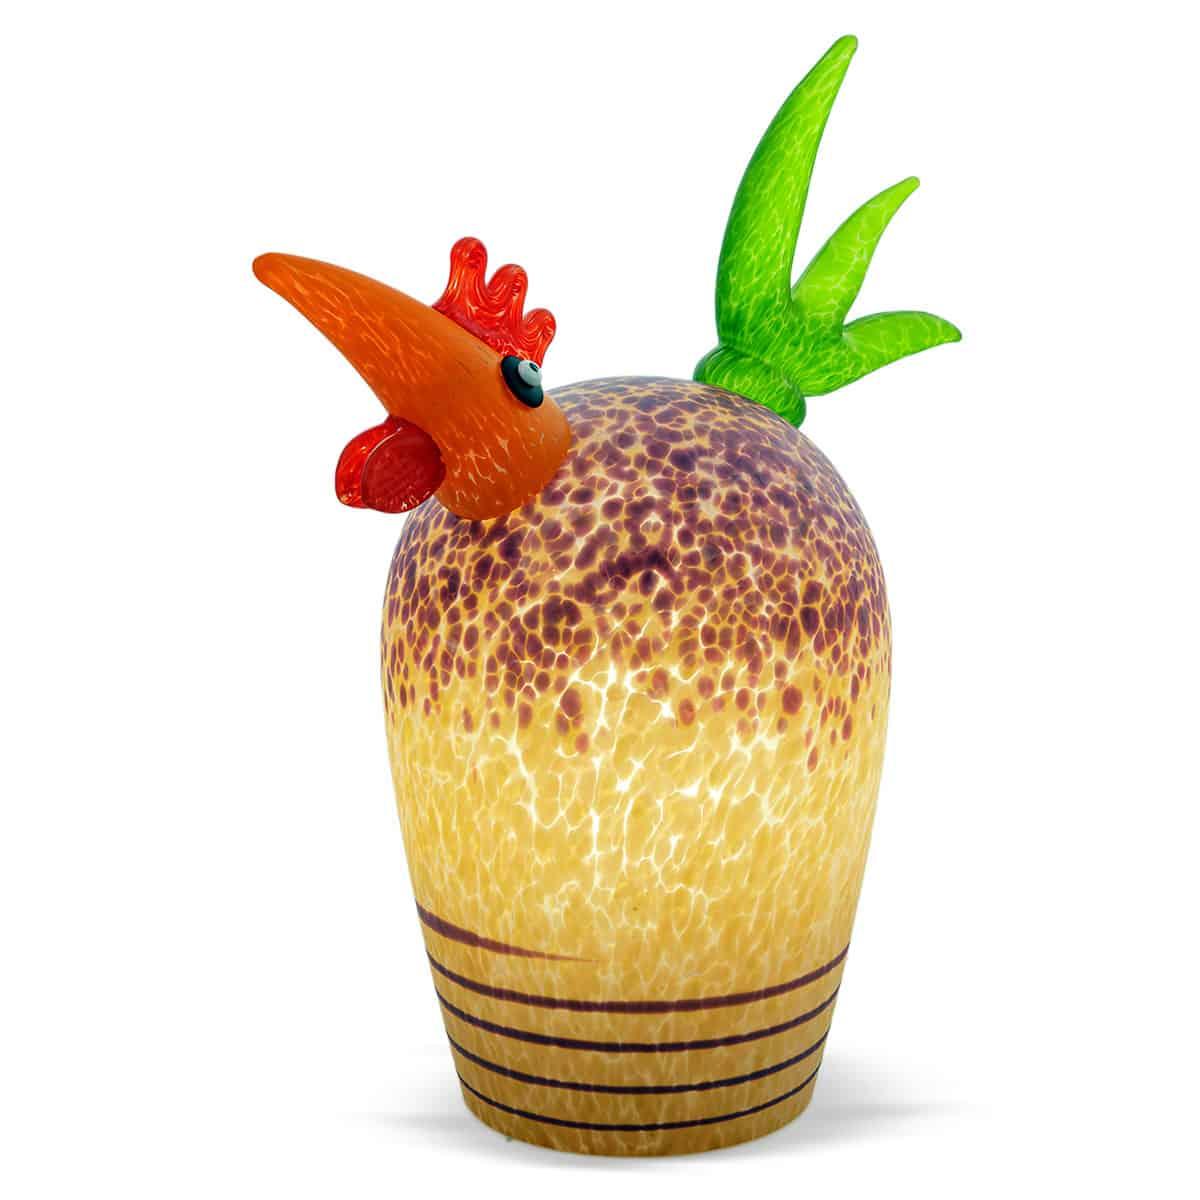 GORDON - Borowski table lamp rooster - apricot